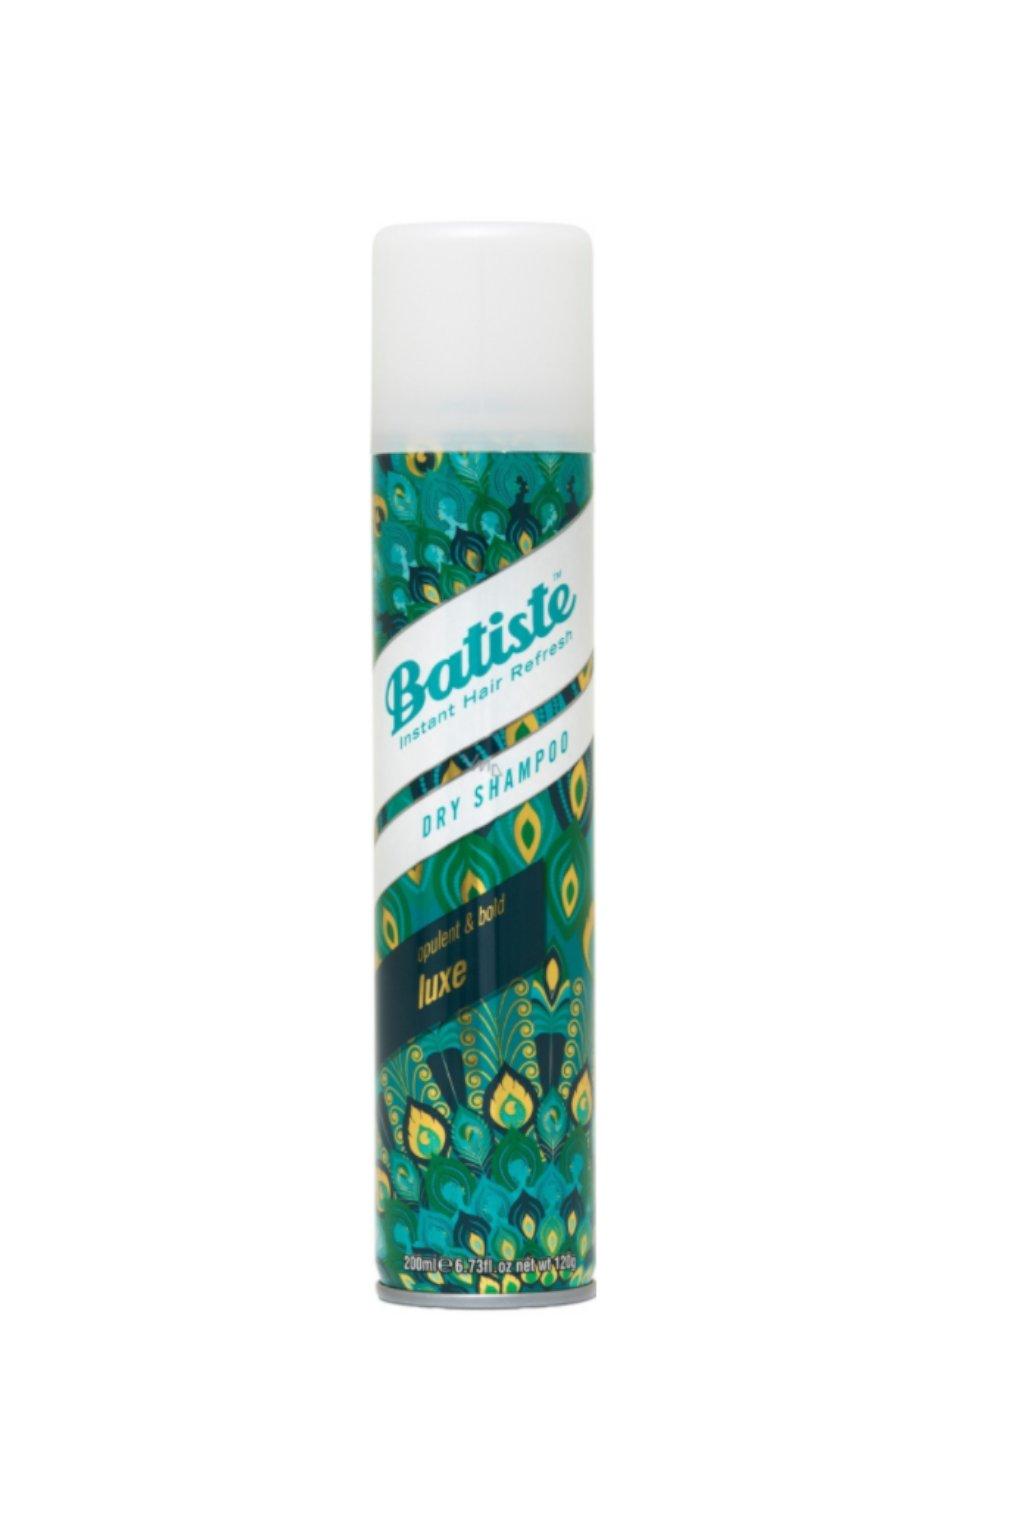 Batiste Dry Shampoo luxe 1024x1364